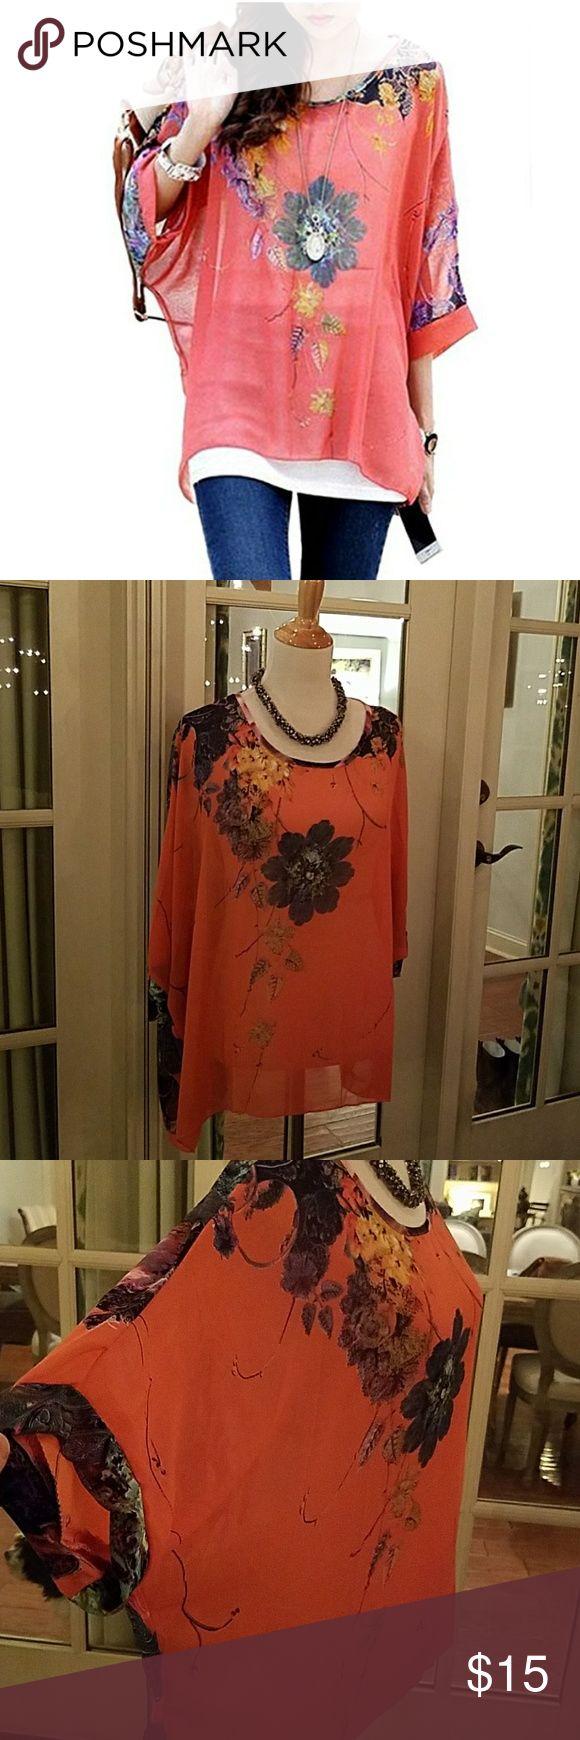 Batwing dolman sleeve chiffon floral top Watermelon colored batwing, dolman sleeve flowy floral top. NWOT imixbox Tops